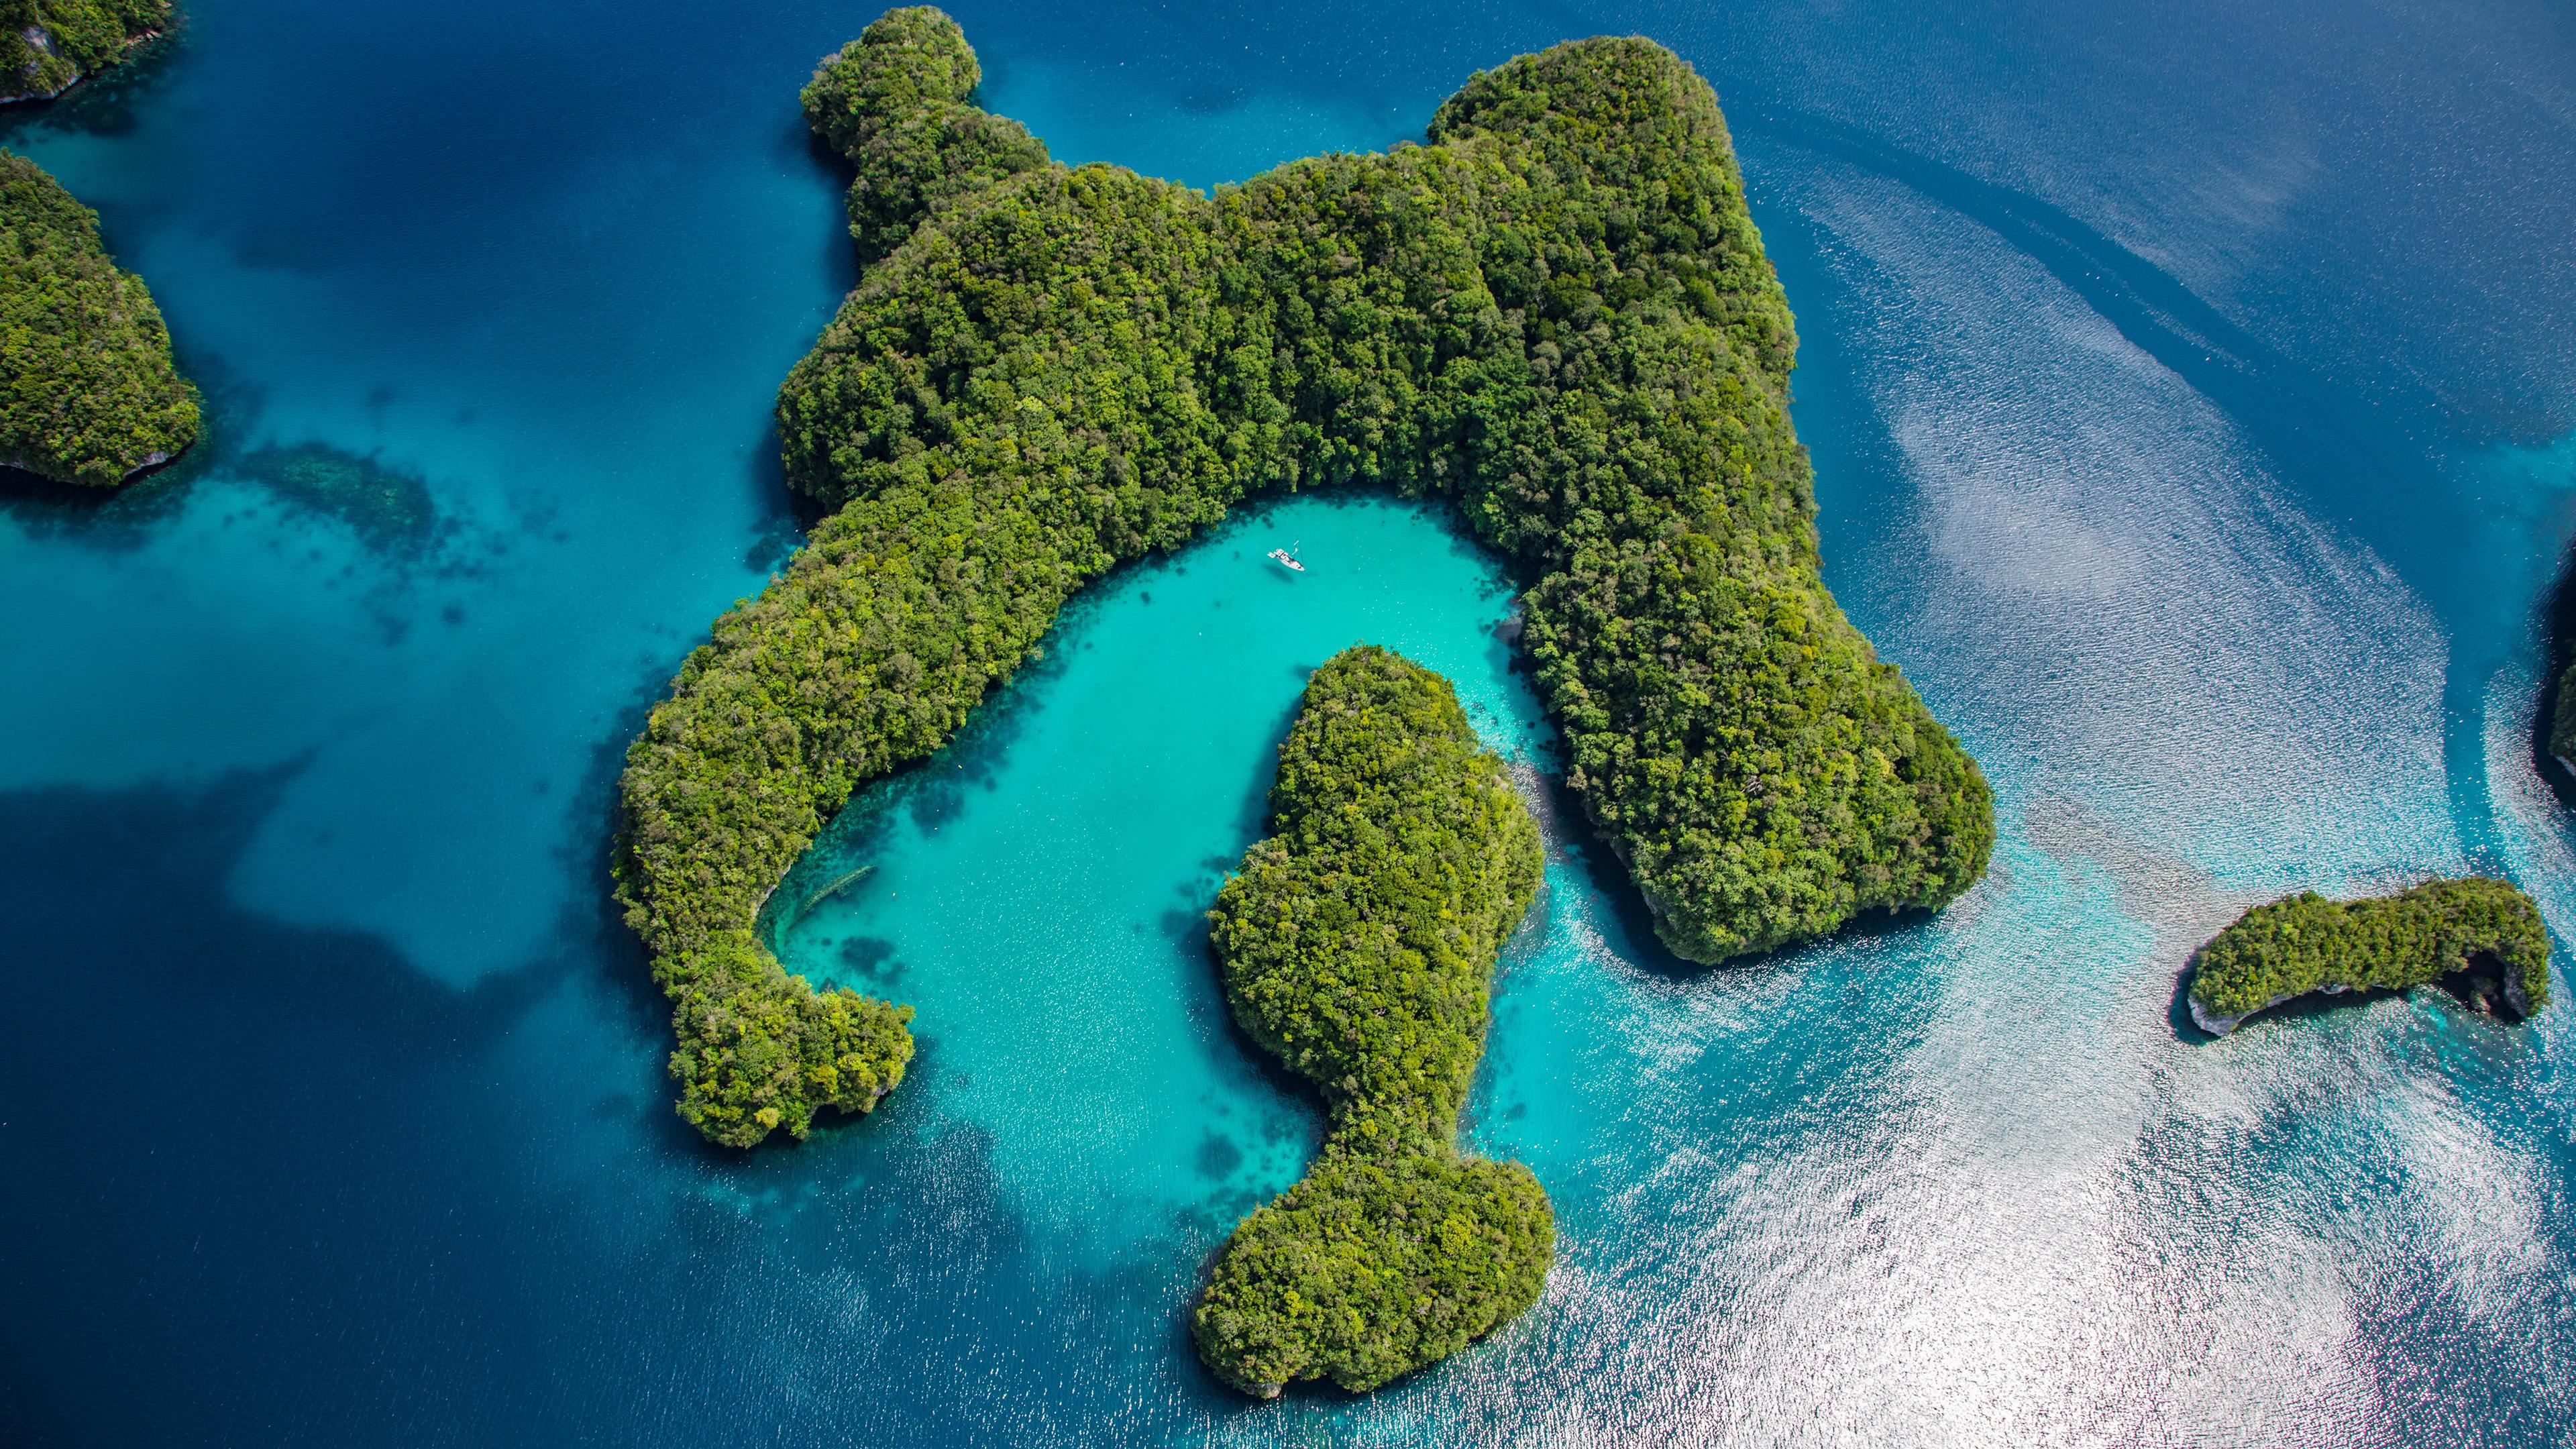 palau philippines islands uhd 4k wallpaper